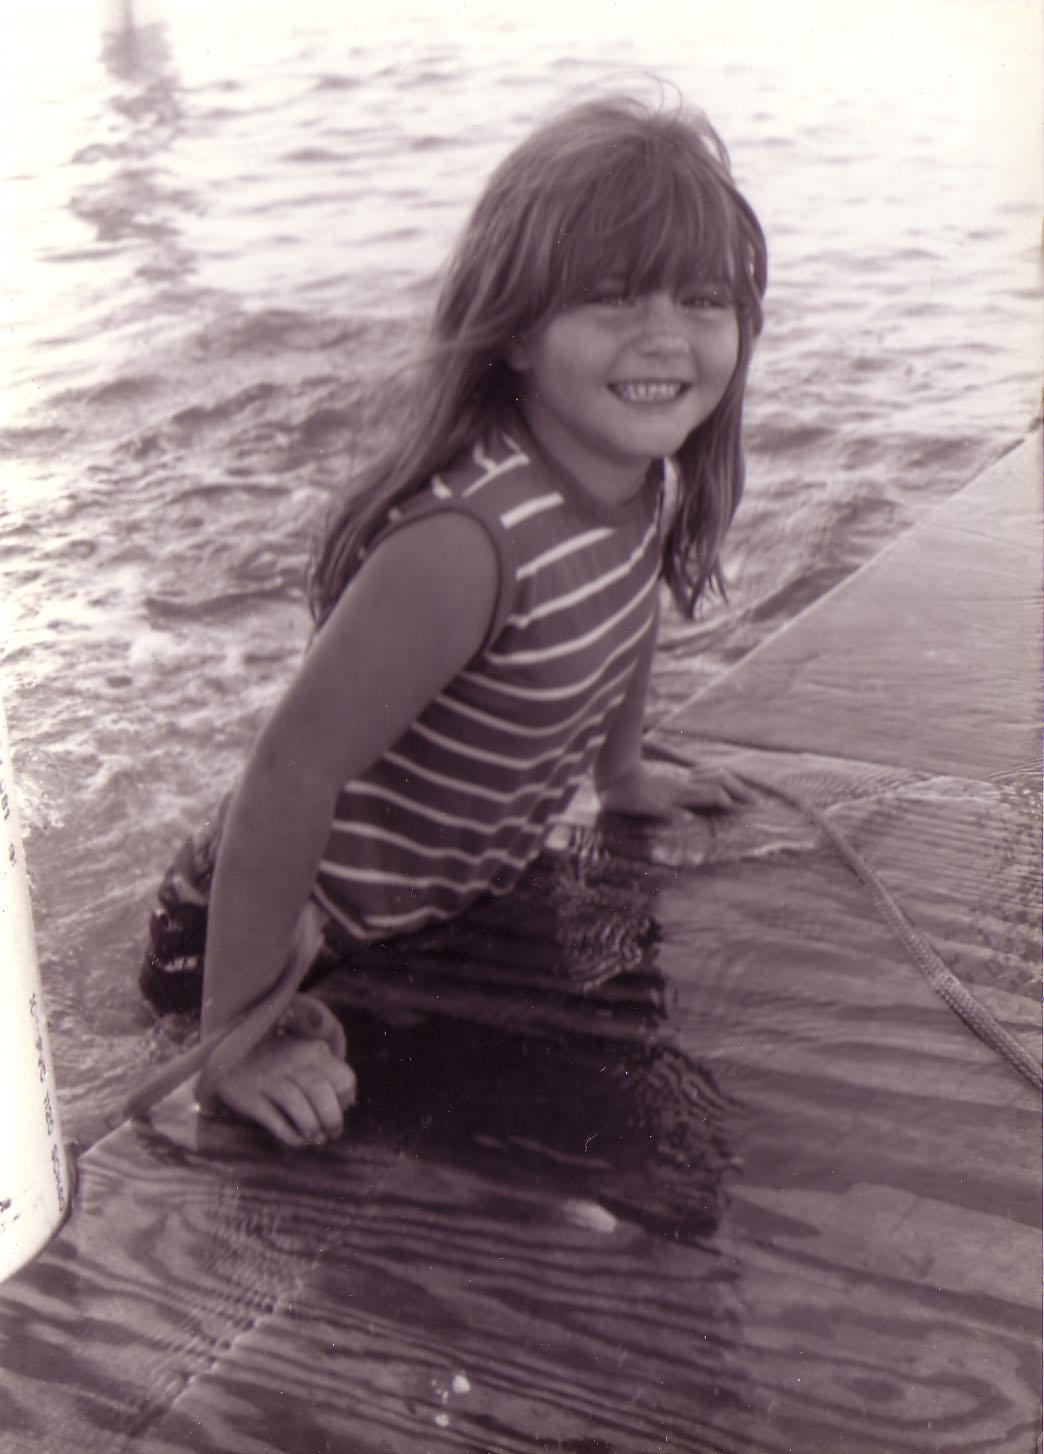 The author at her family's stilt house, circa 1980.